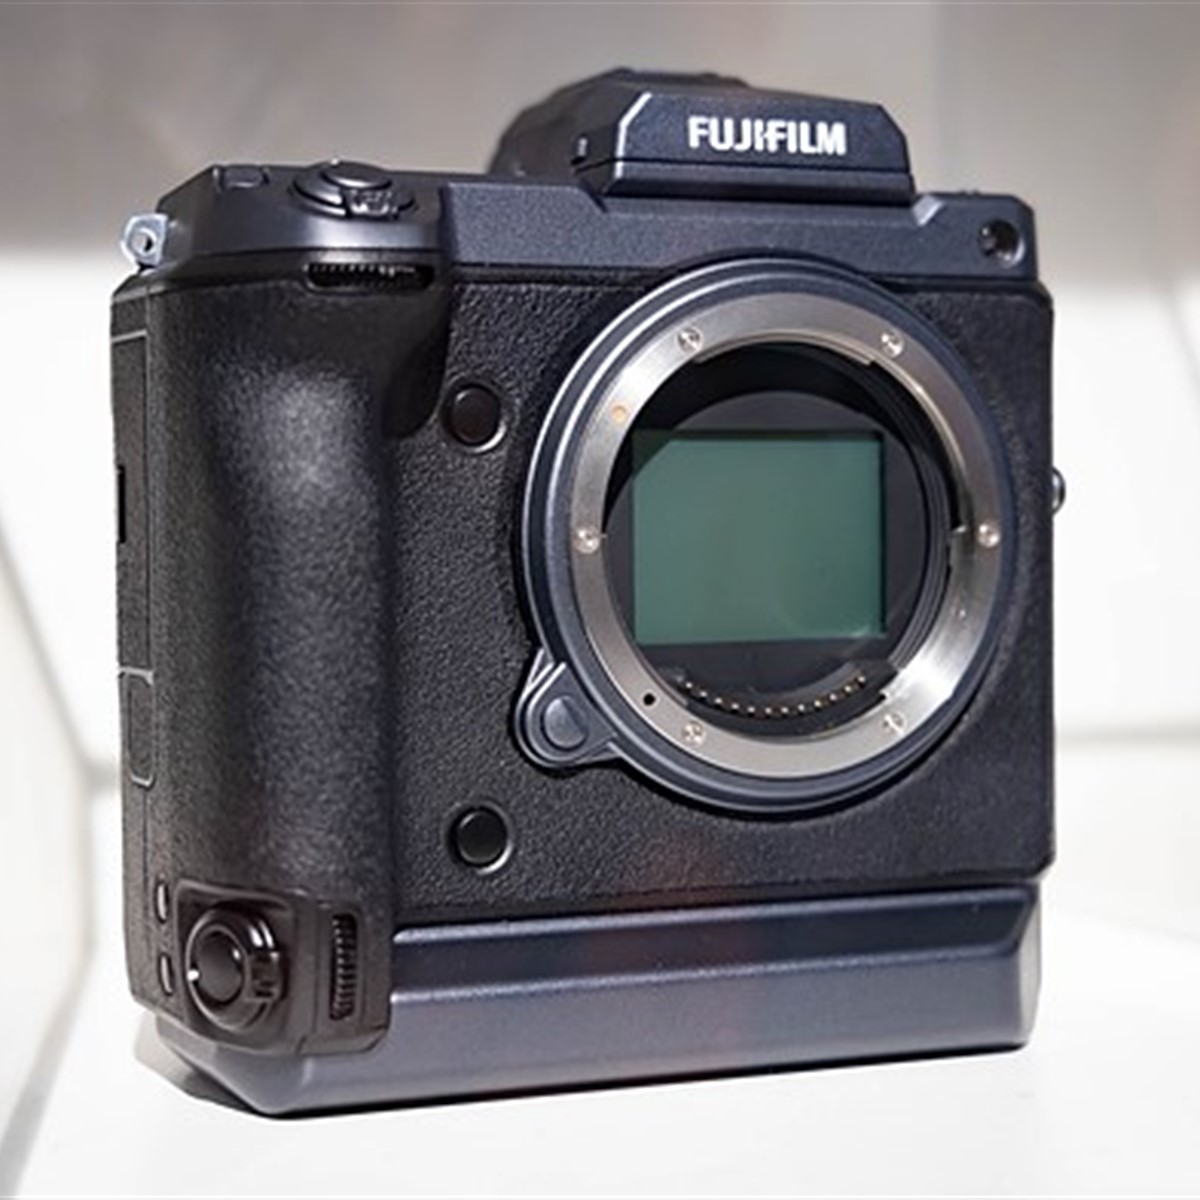 New Sony sensor specs resemble chips found inside Fujifilm X-T3